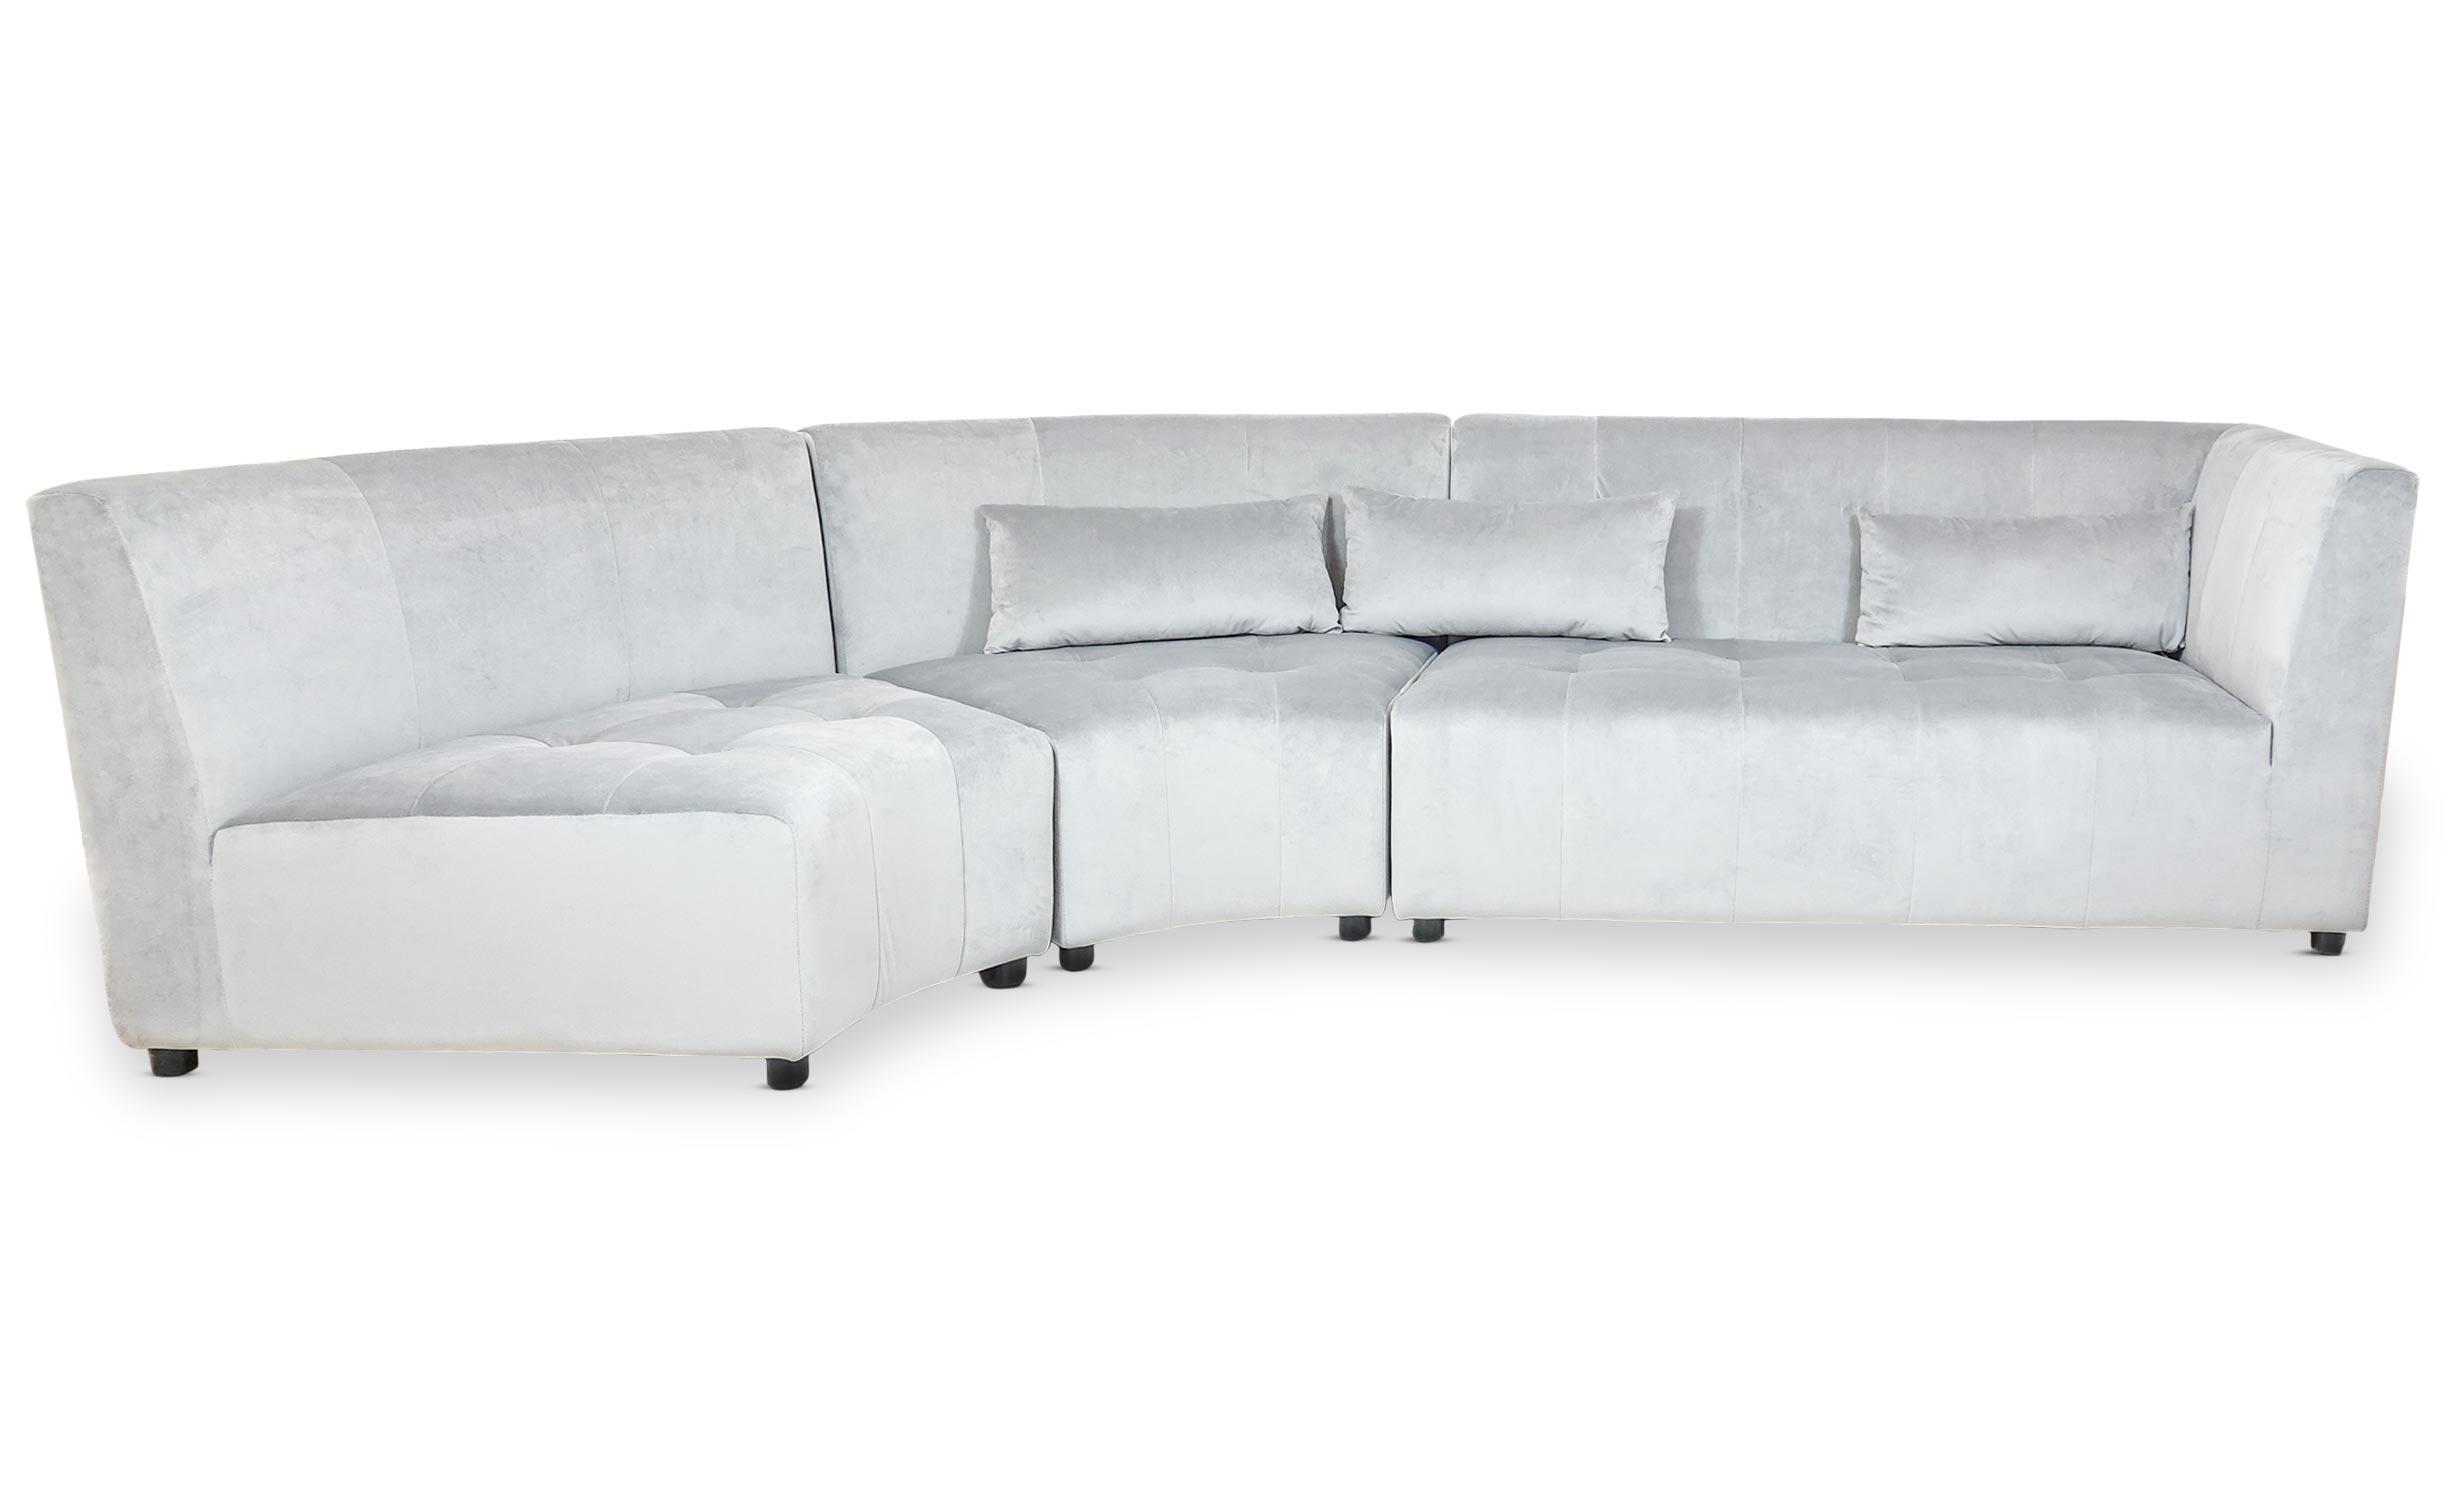 Canapé d'angle Dojo Velours Gris